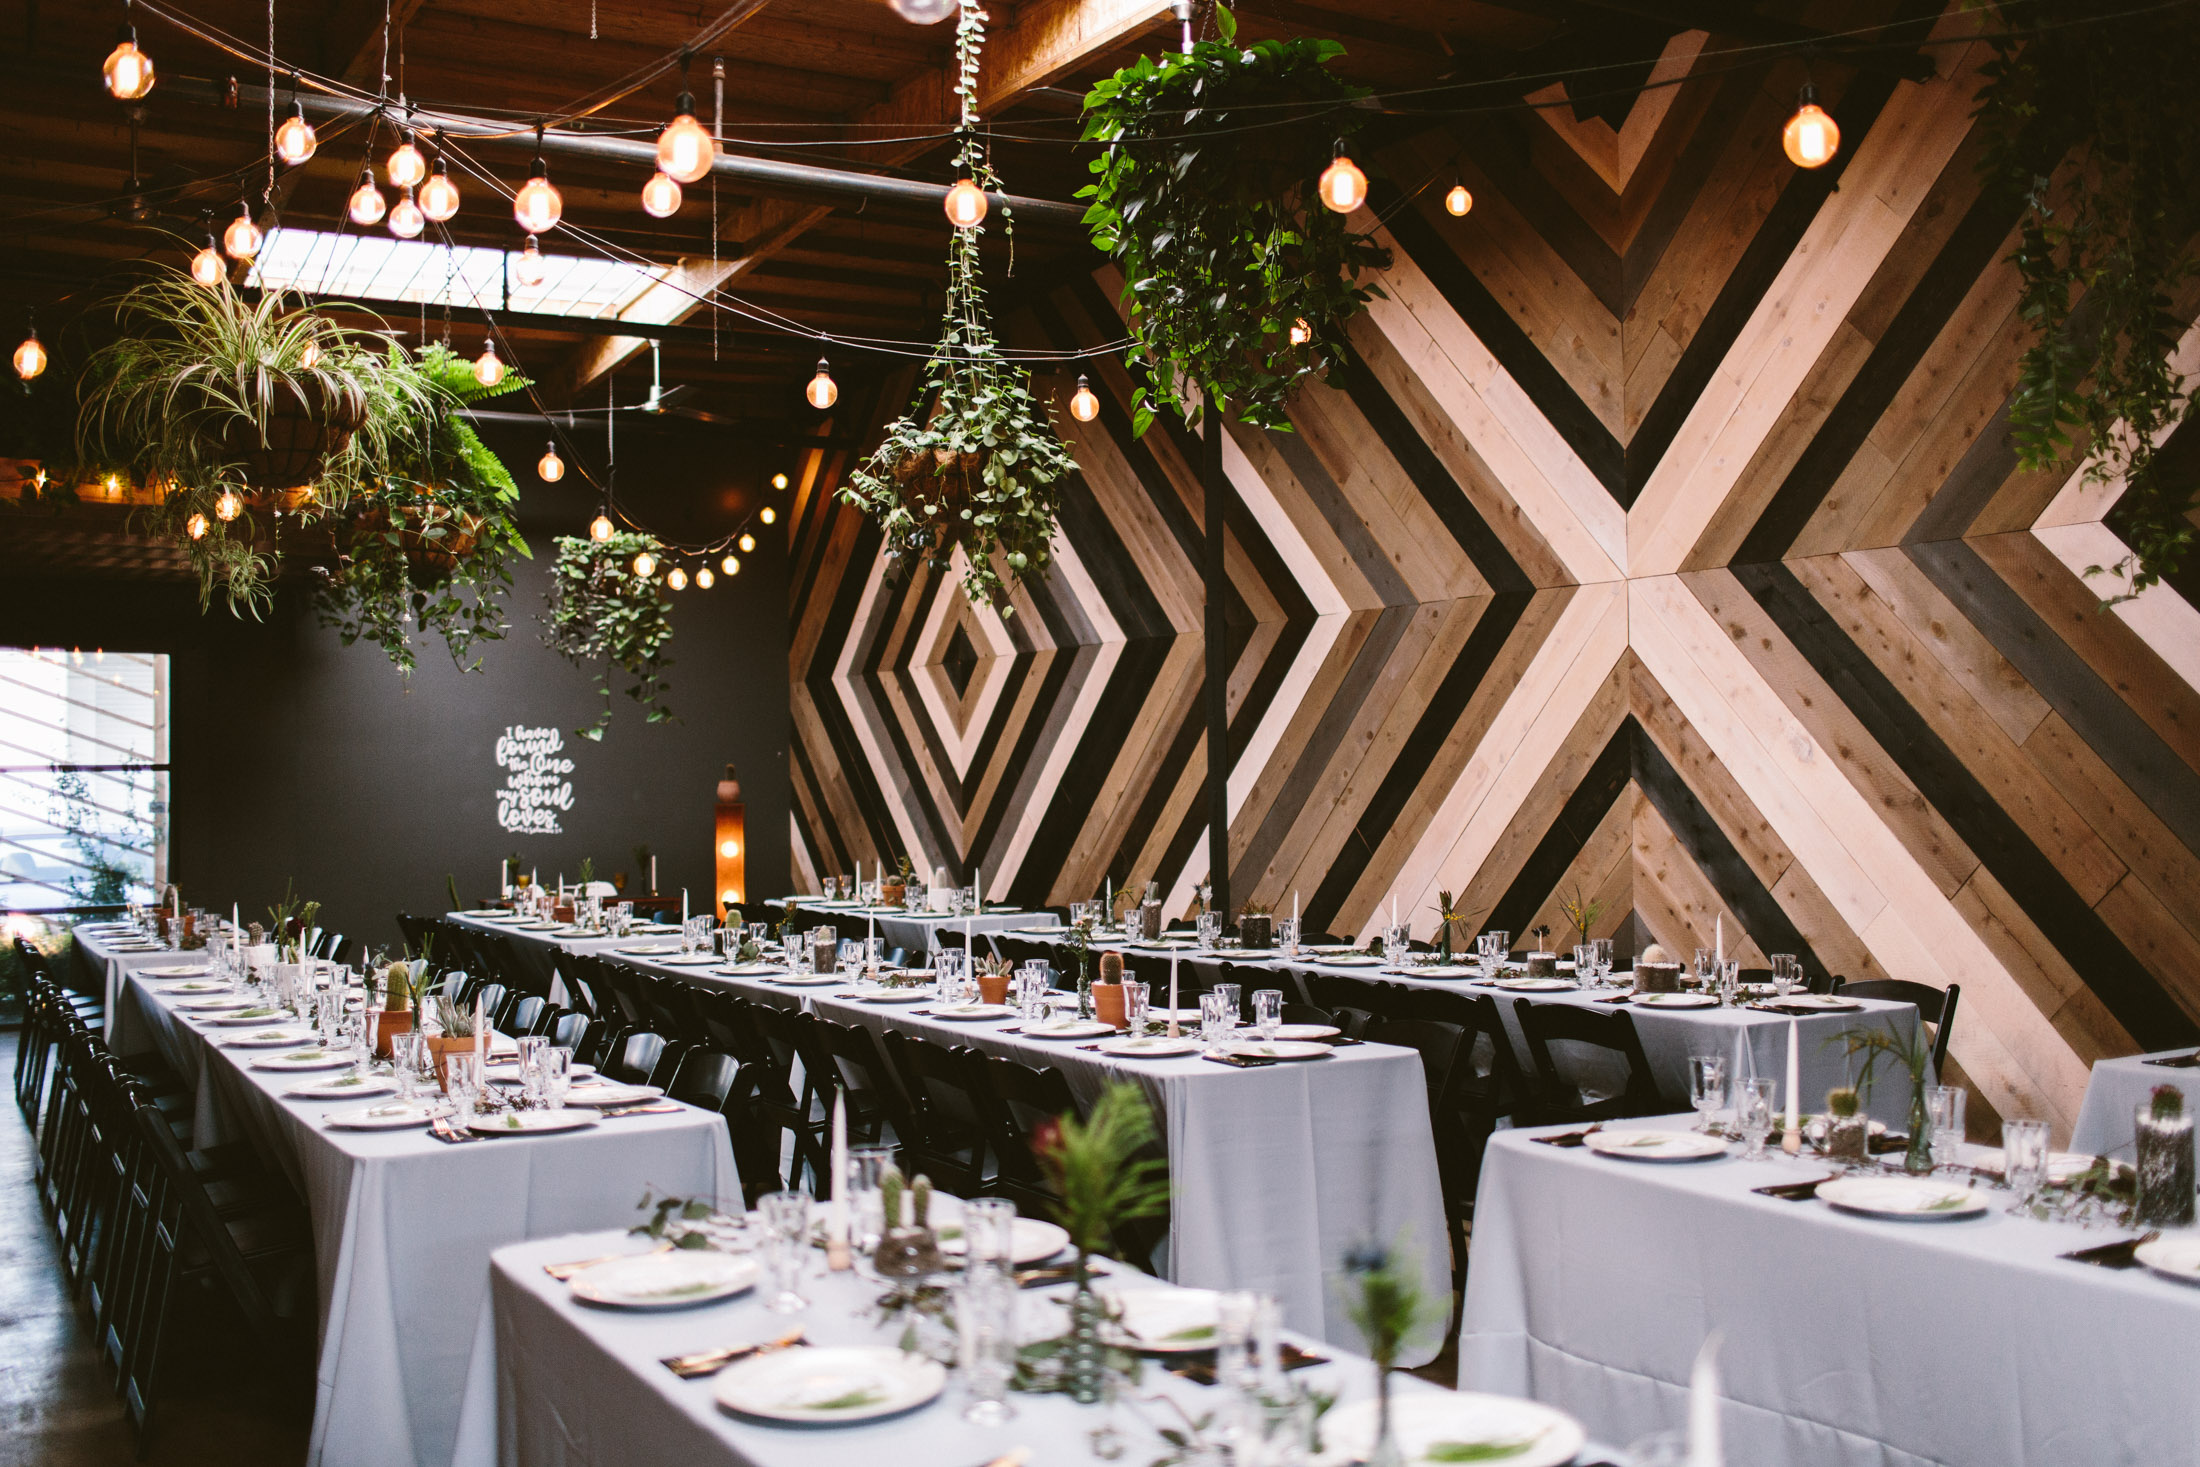 The-woodshed-booze-brothers-venue-wedding-45.jpg